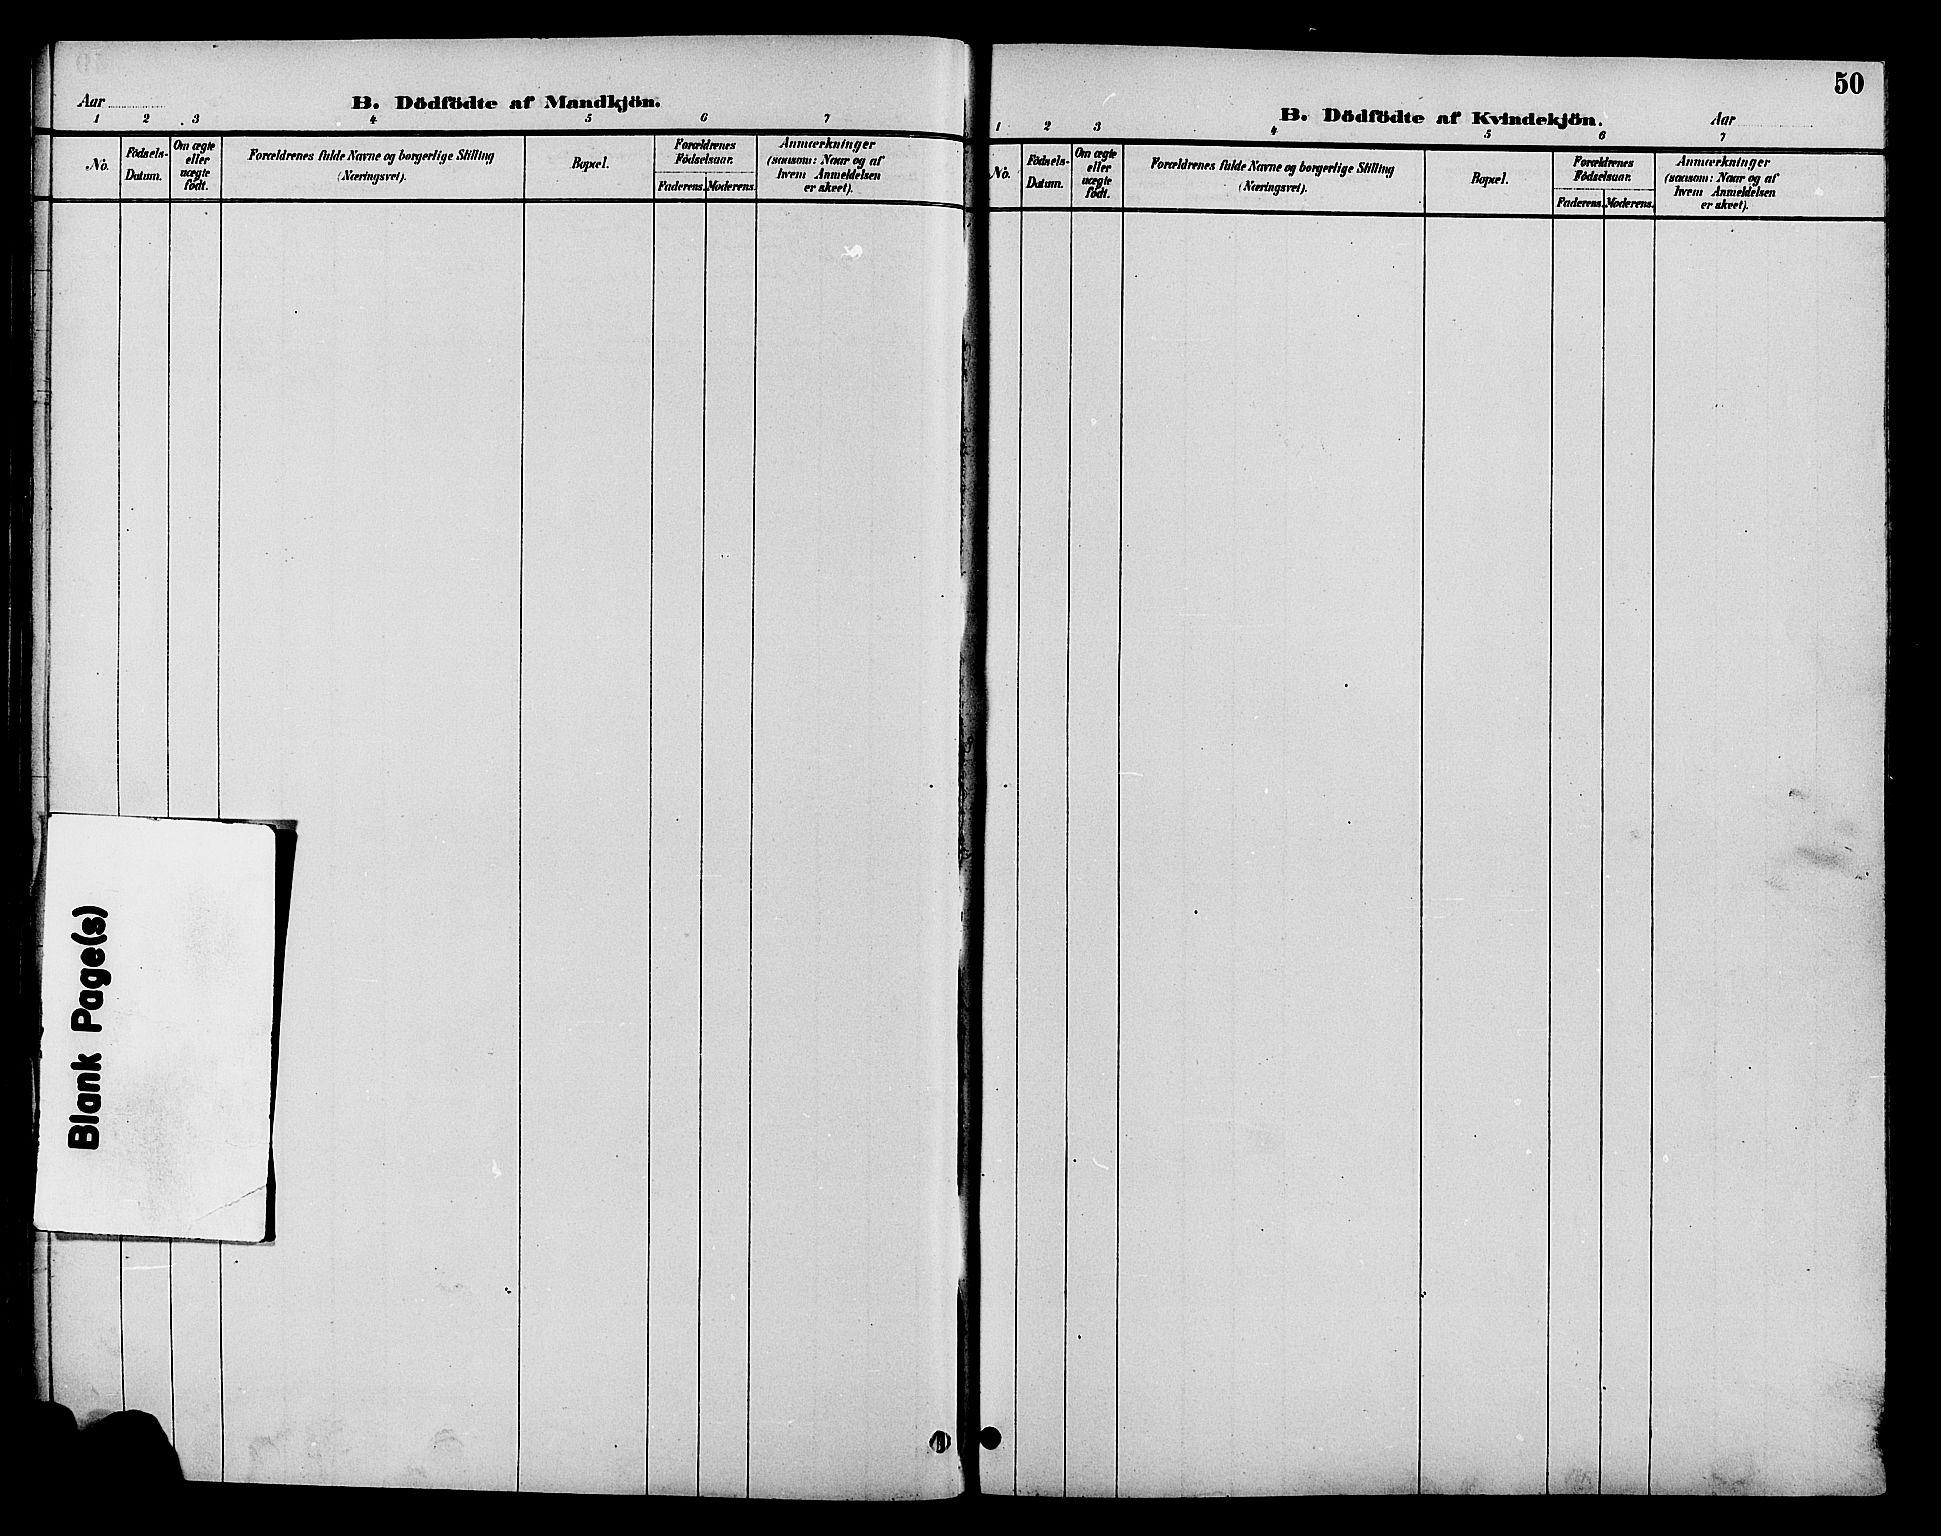 SAH, Øystre Slidre prestekontor, Klokkerbok nr. 4, 1887-1907, s. 50